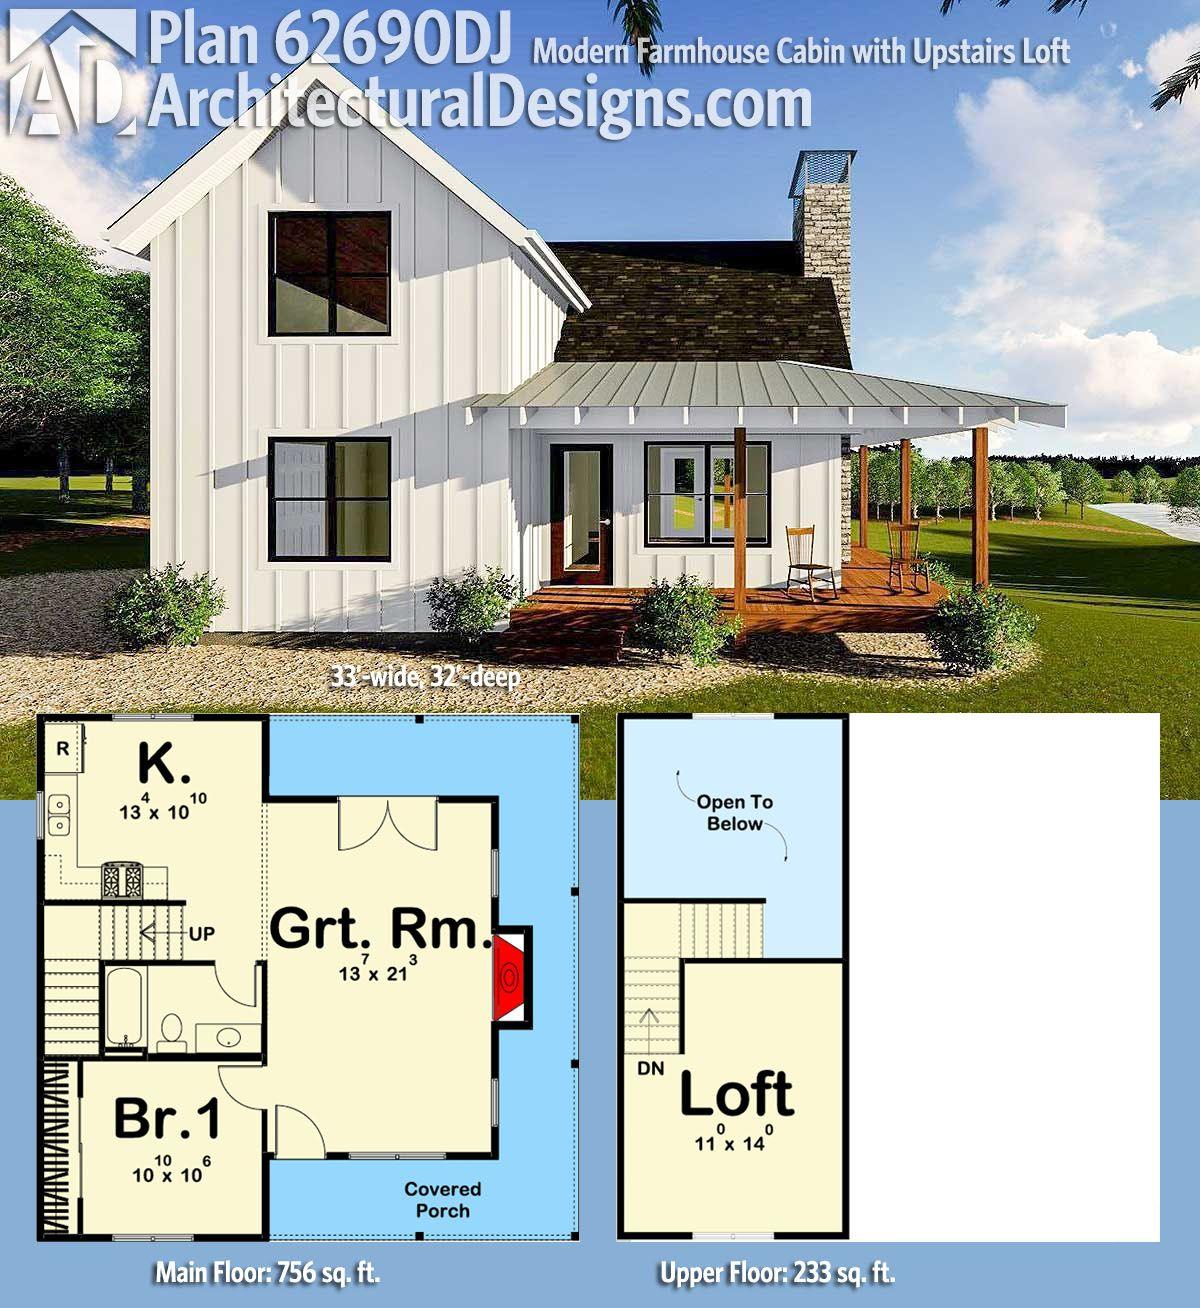 Plan 62690dj Modern Farmhouse Cabin With Upstairs Loft House Plans Farmhouse Architectural Design House Plans House Plans